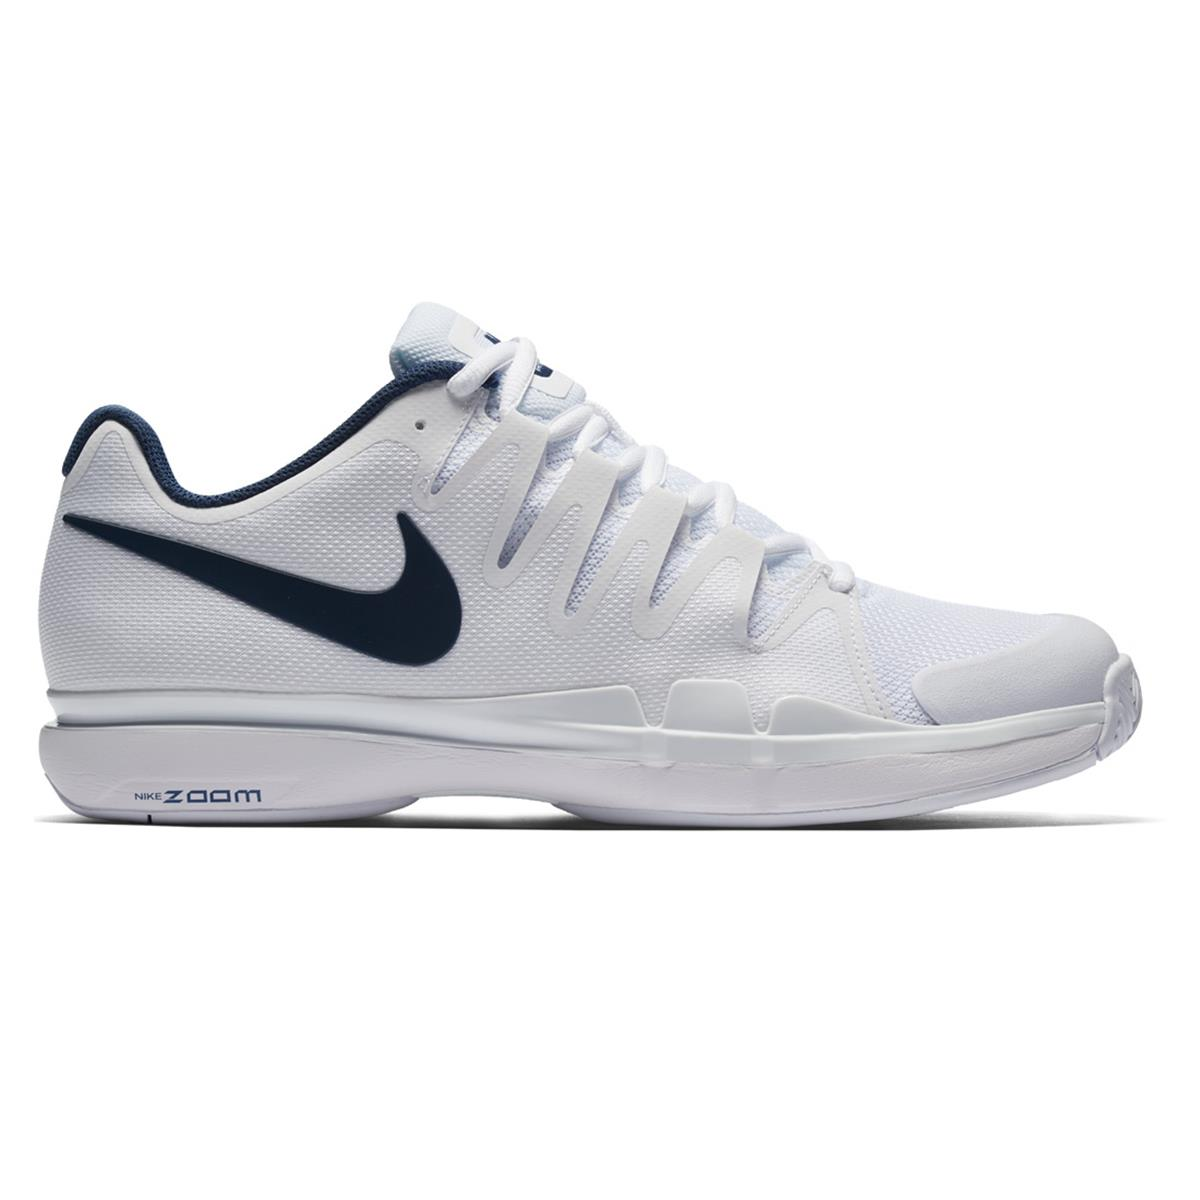 4e00b45f129 Nike Zoom Vapor 9.5 Tour Mens Tennis Shoes (White-Blue)